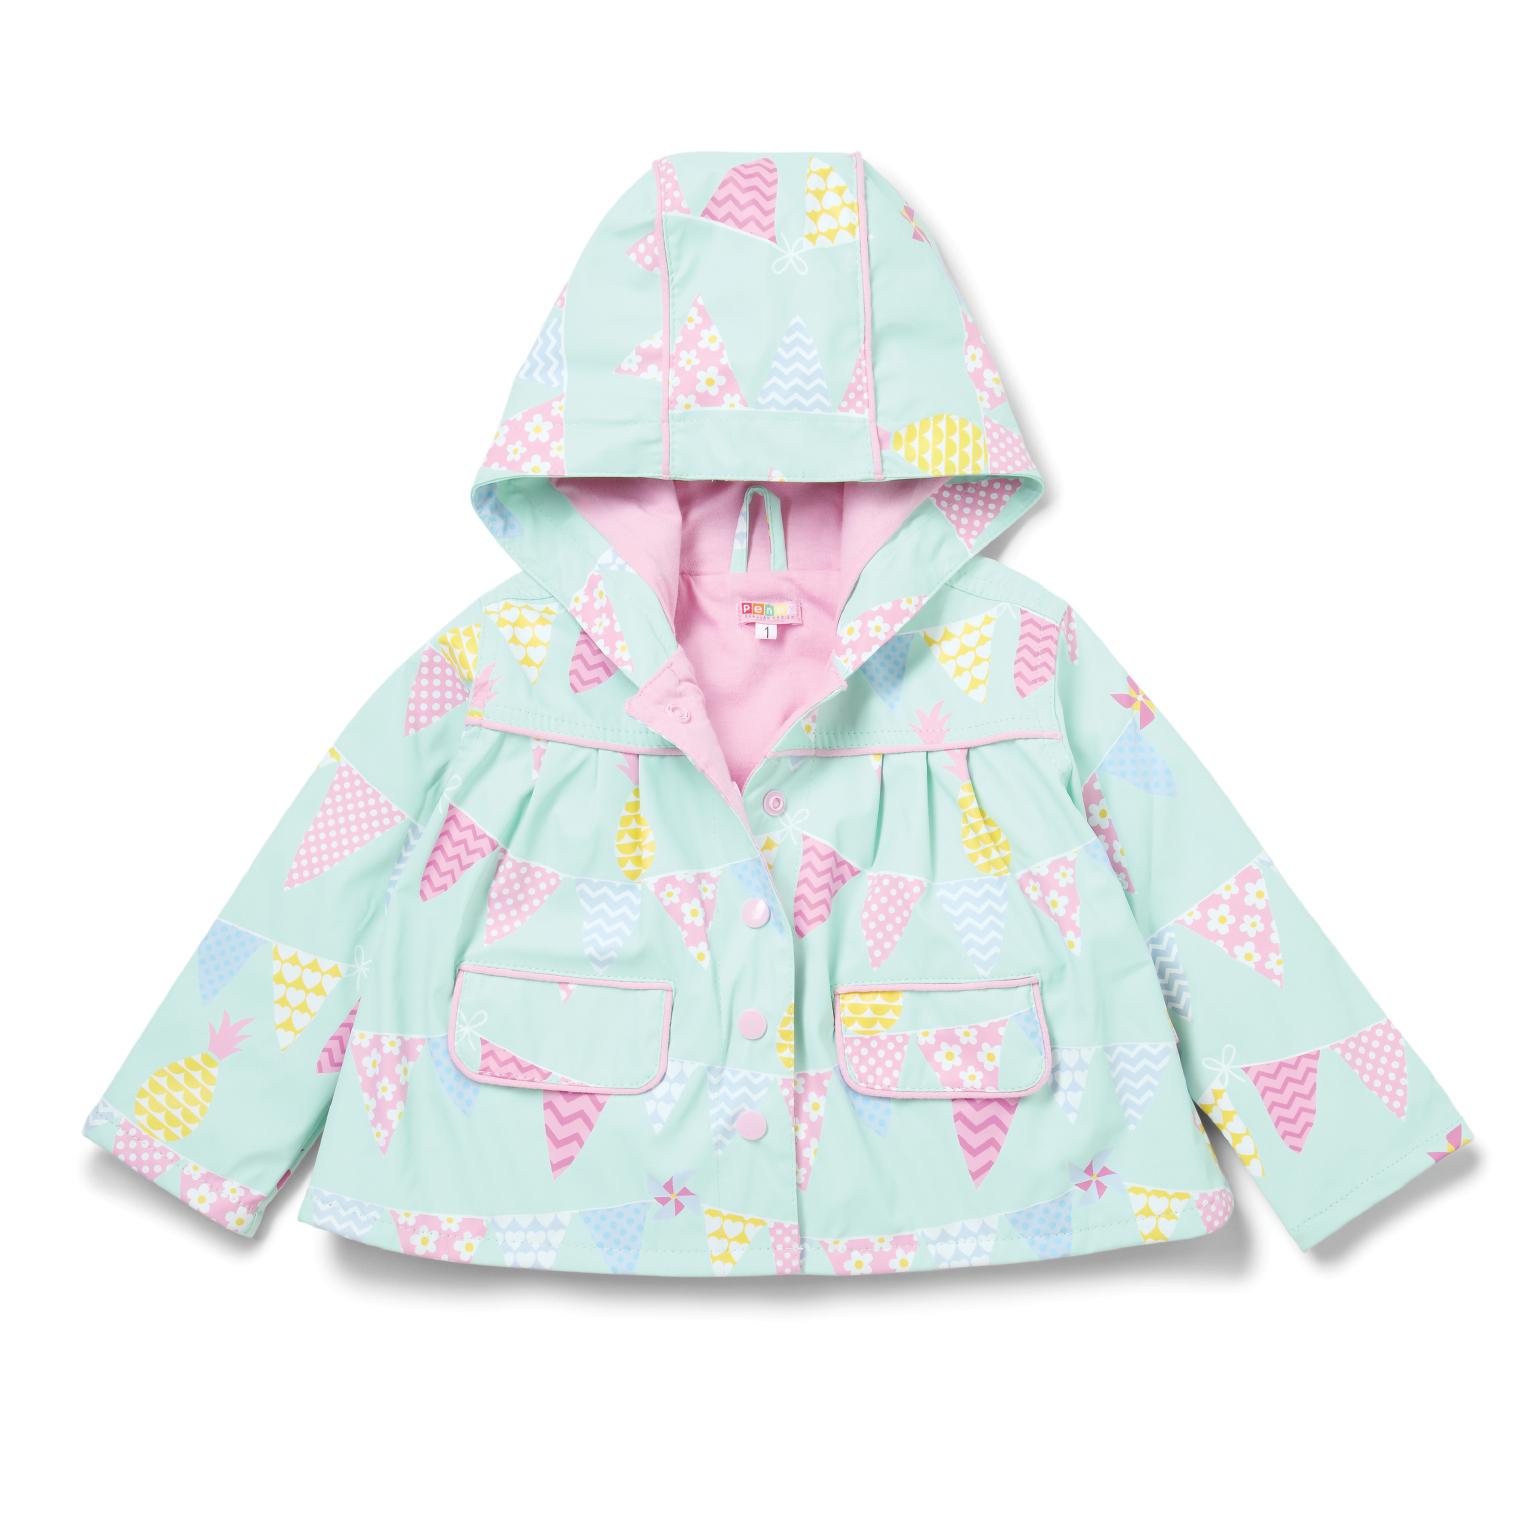 Raincoat Pineapple Bunting - Size 1-2 image